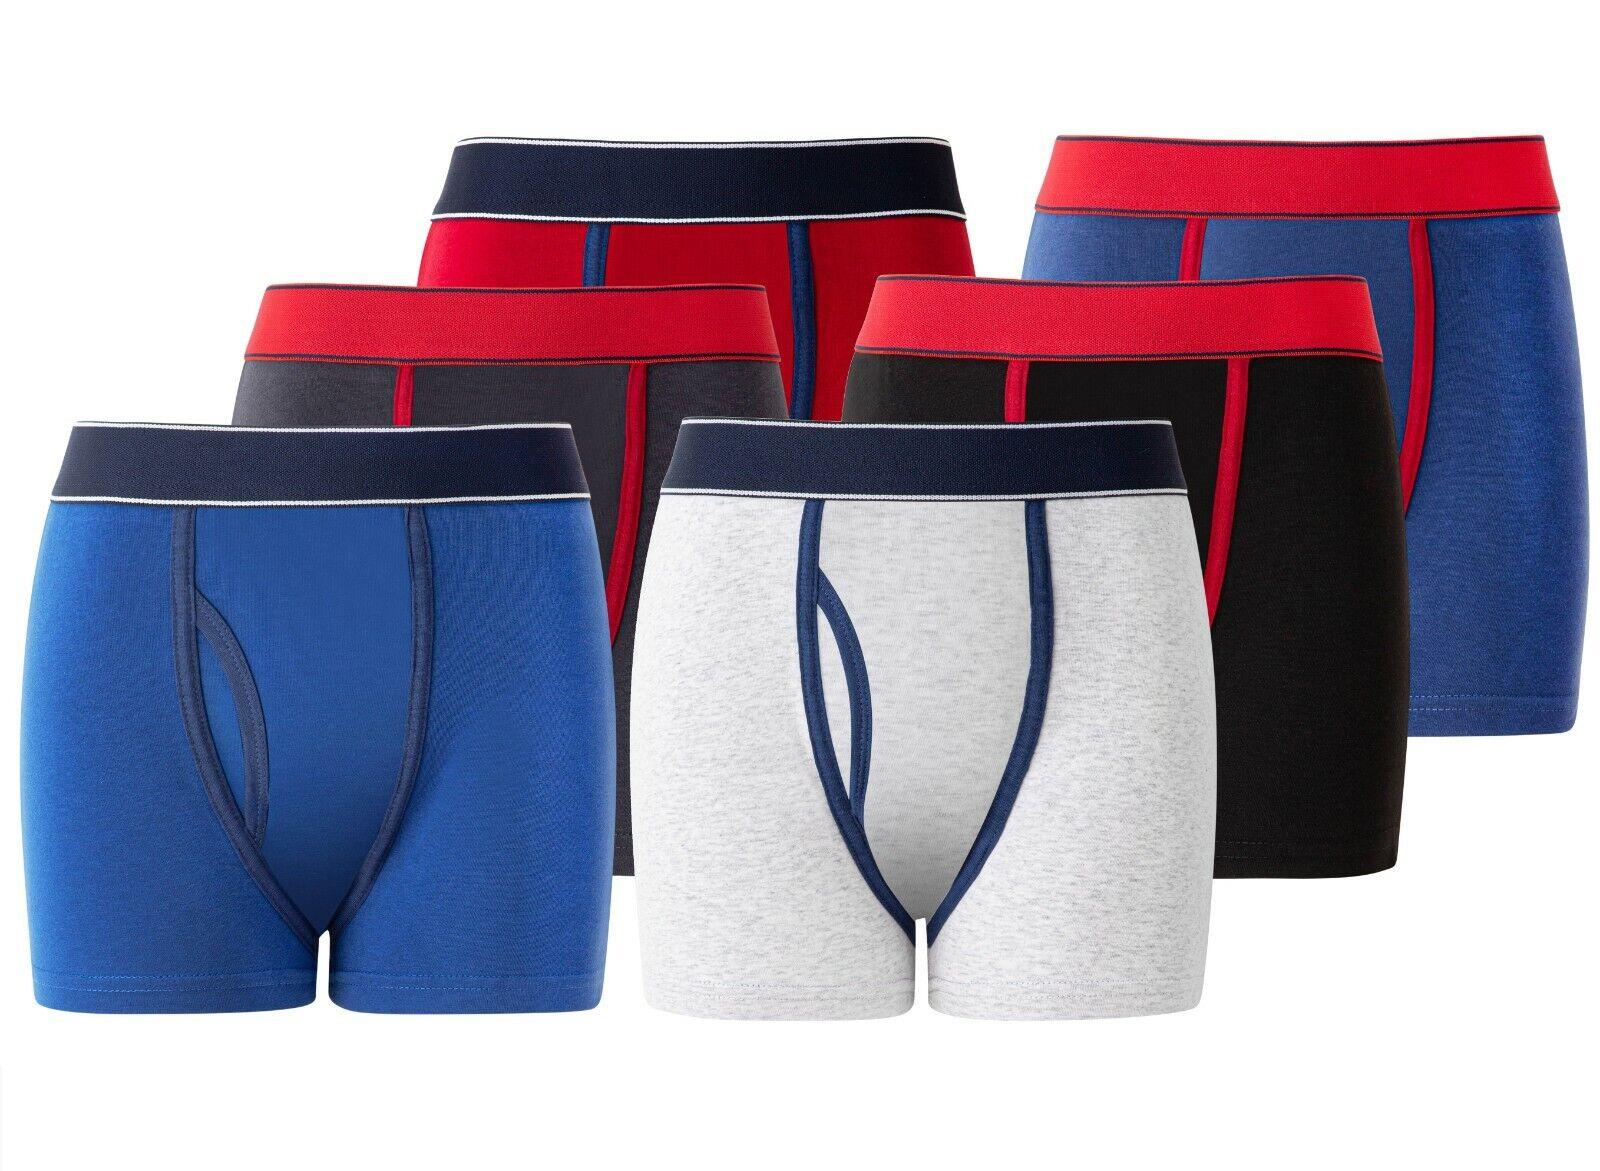 Boys Boxer Shorts Trunks with Keyhole